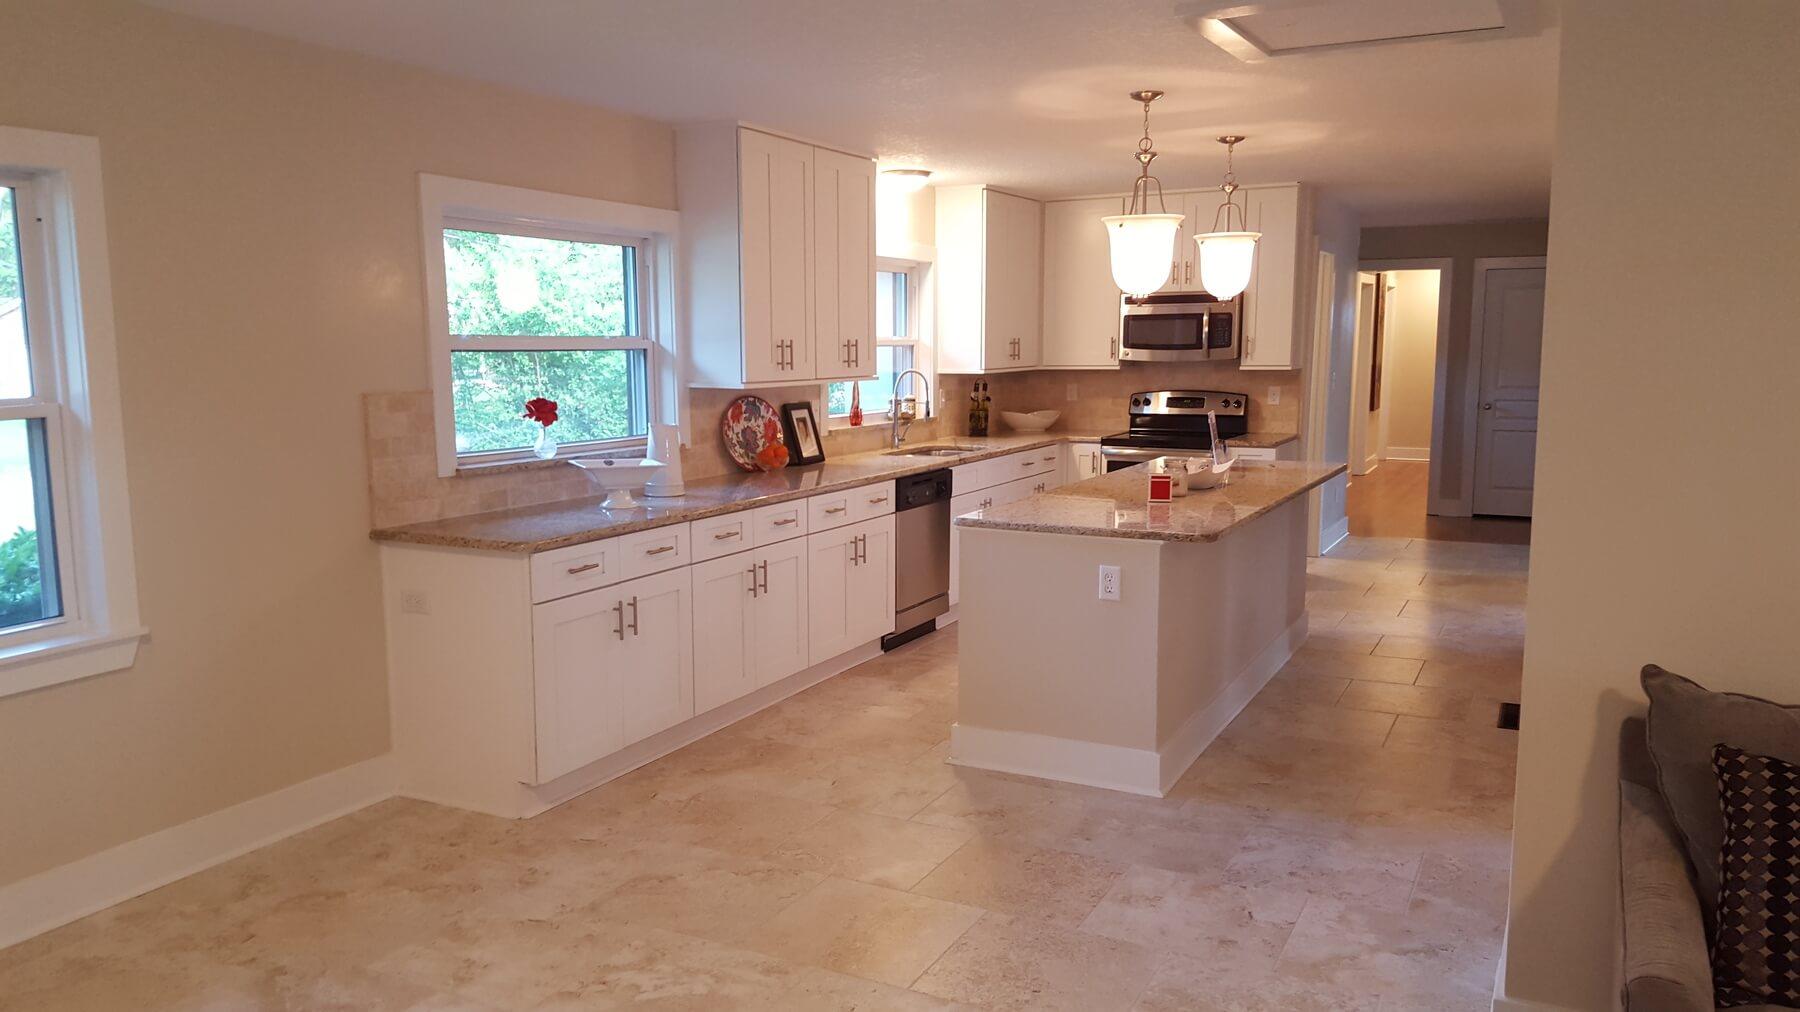 kitchens kitchen remodel jacksonville fl View More